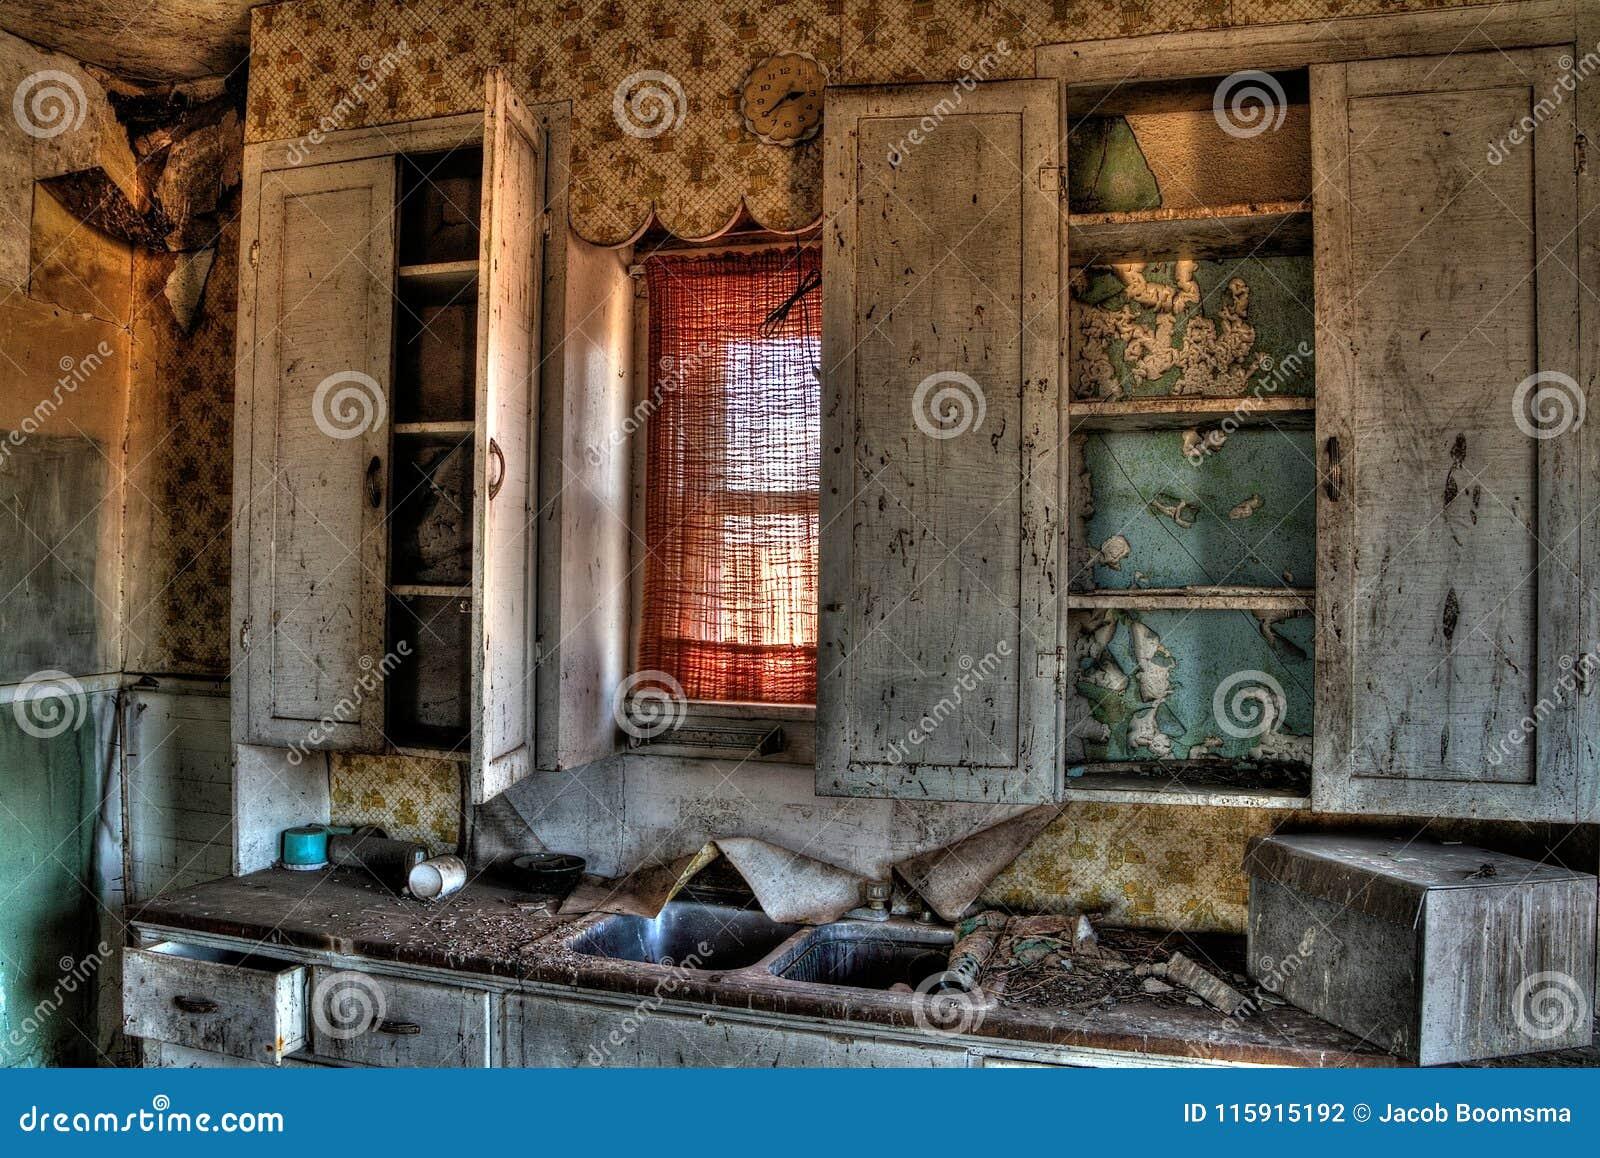 Abandoned Farm Houses In Rural South Dakota Slowly Decay